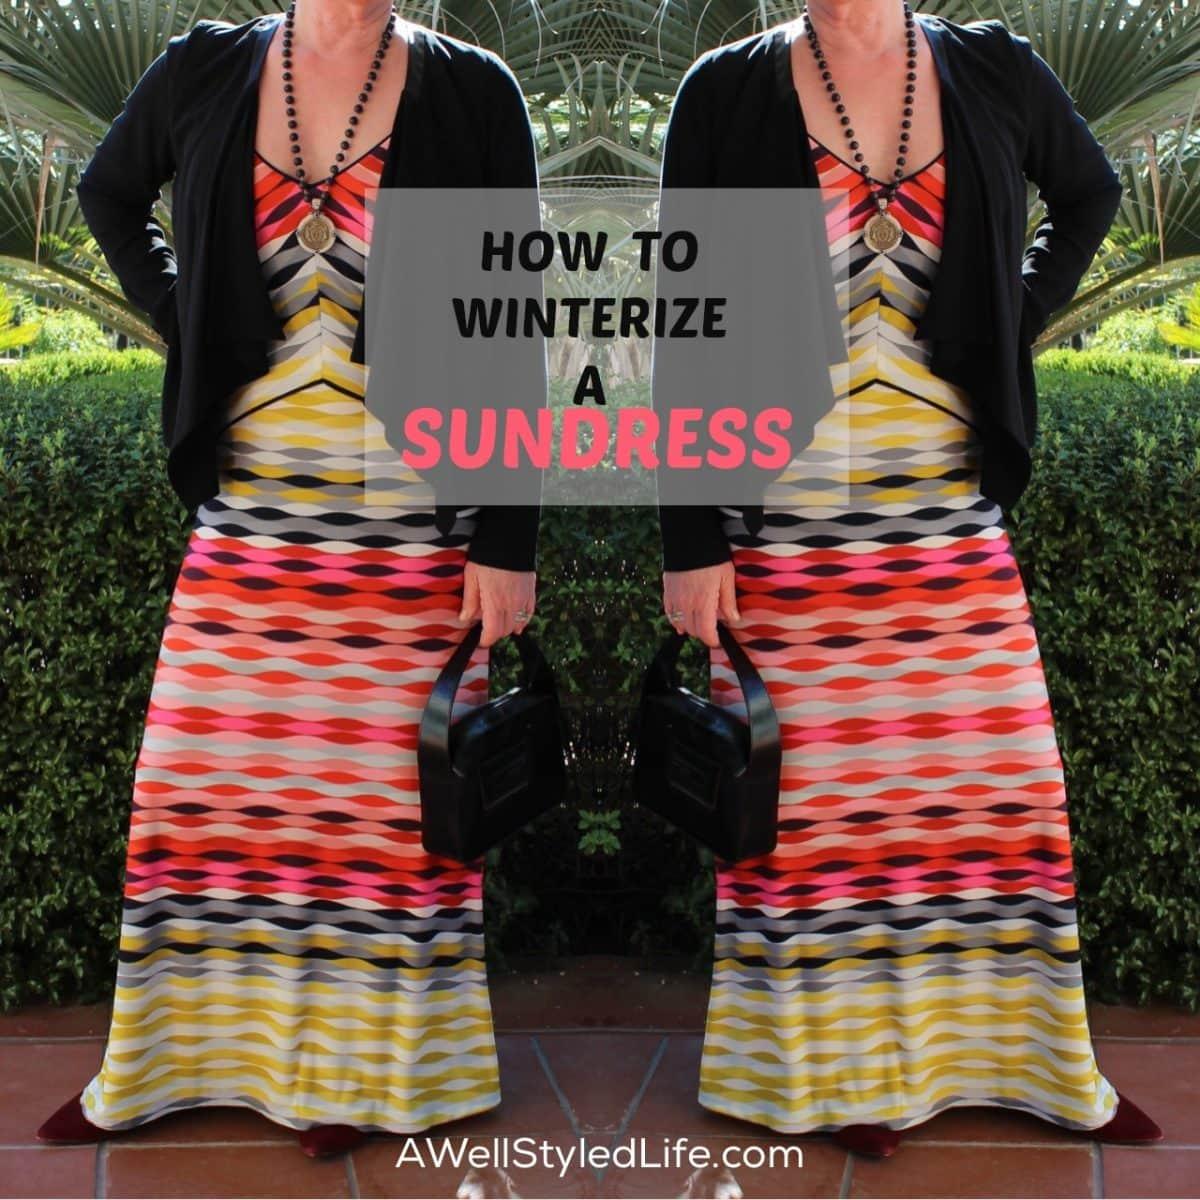 How to Winterize a Sundress